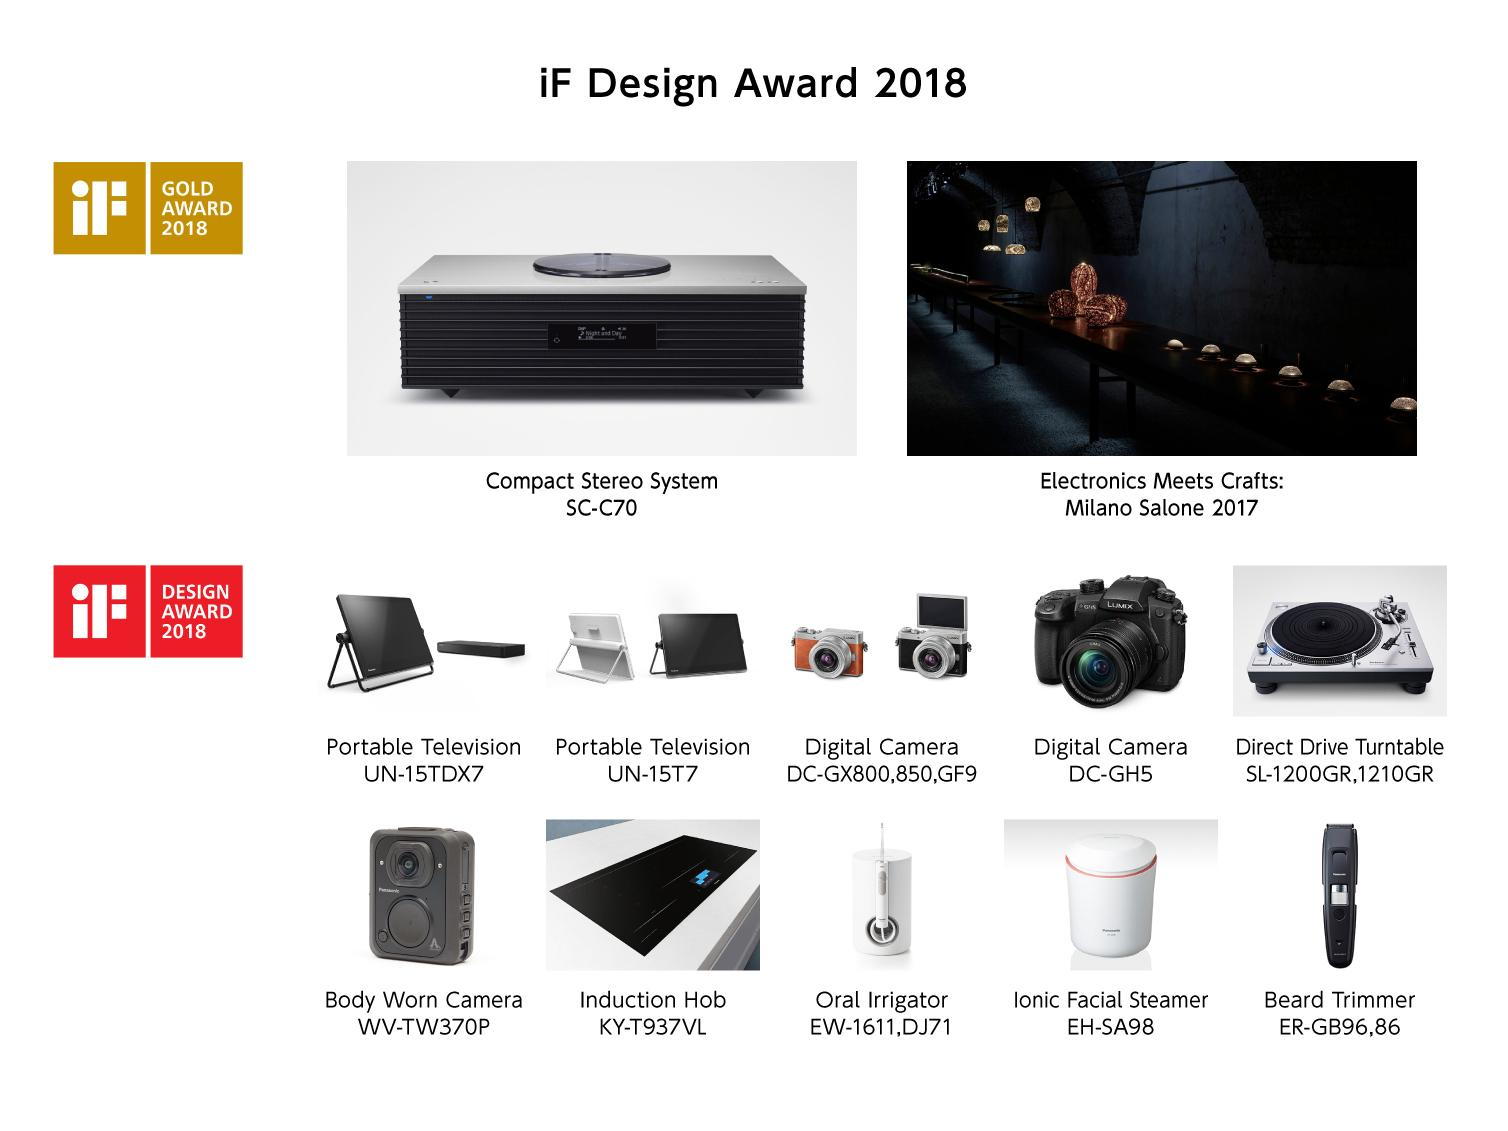 image: panasonic won 12 awards at iF design award 2018